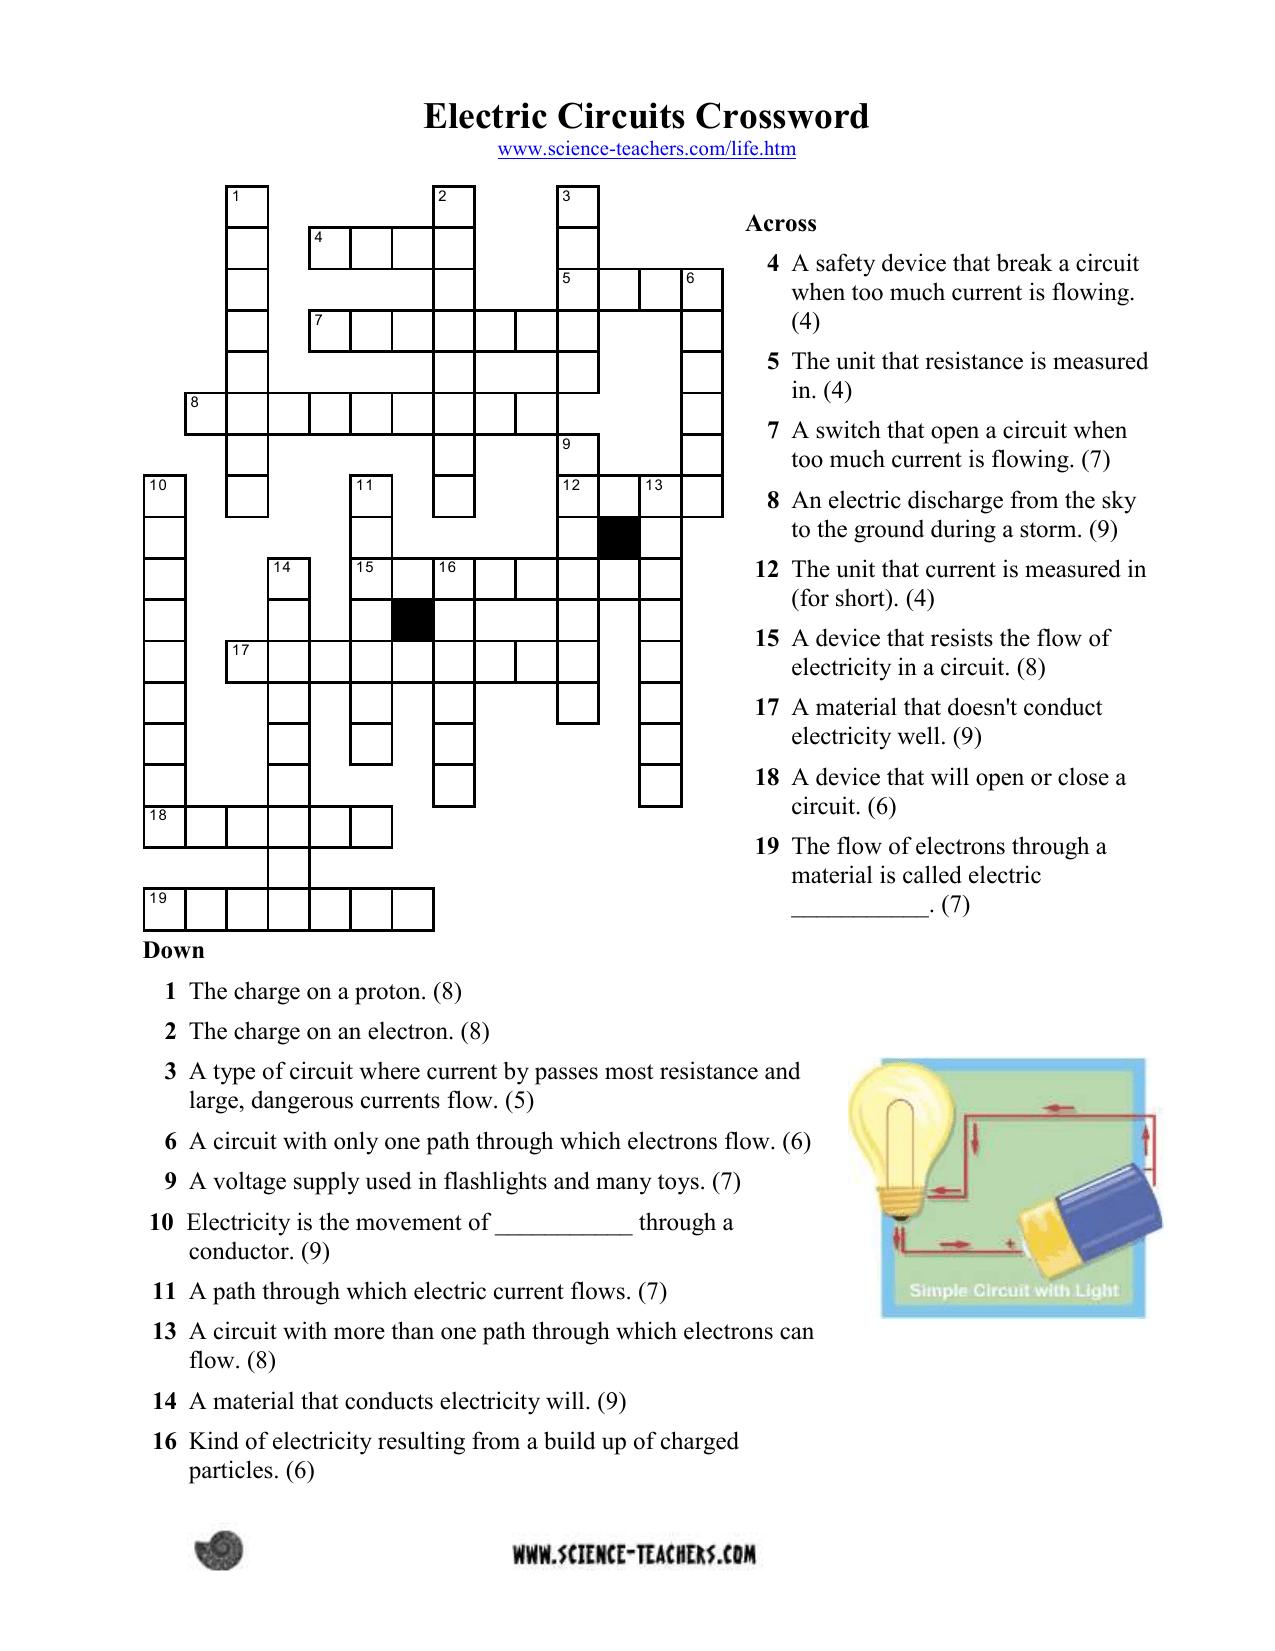 Electric Circuits Crossword 1